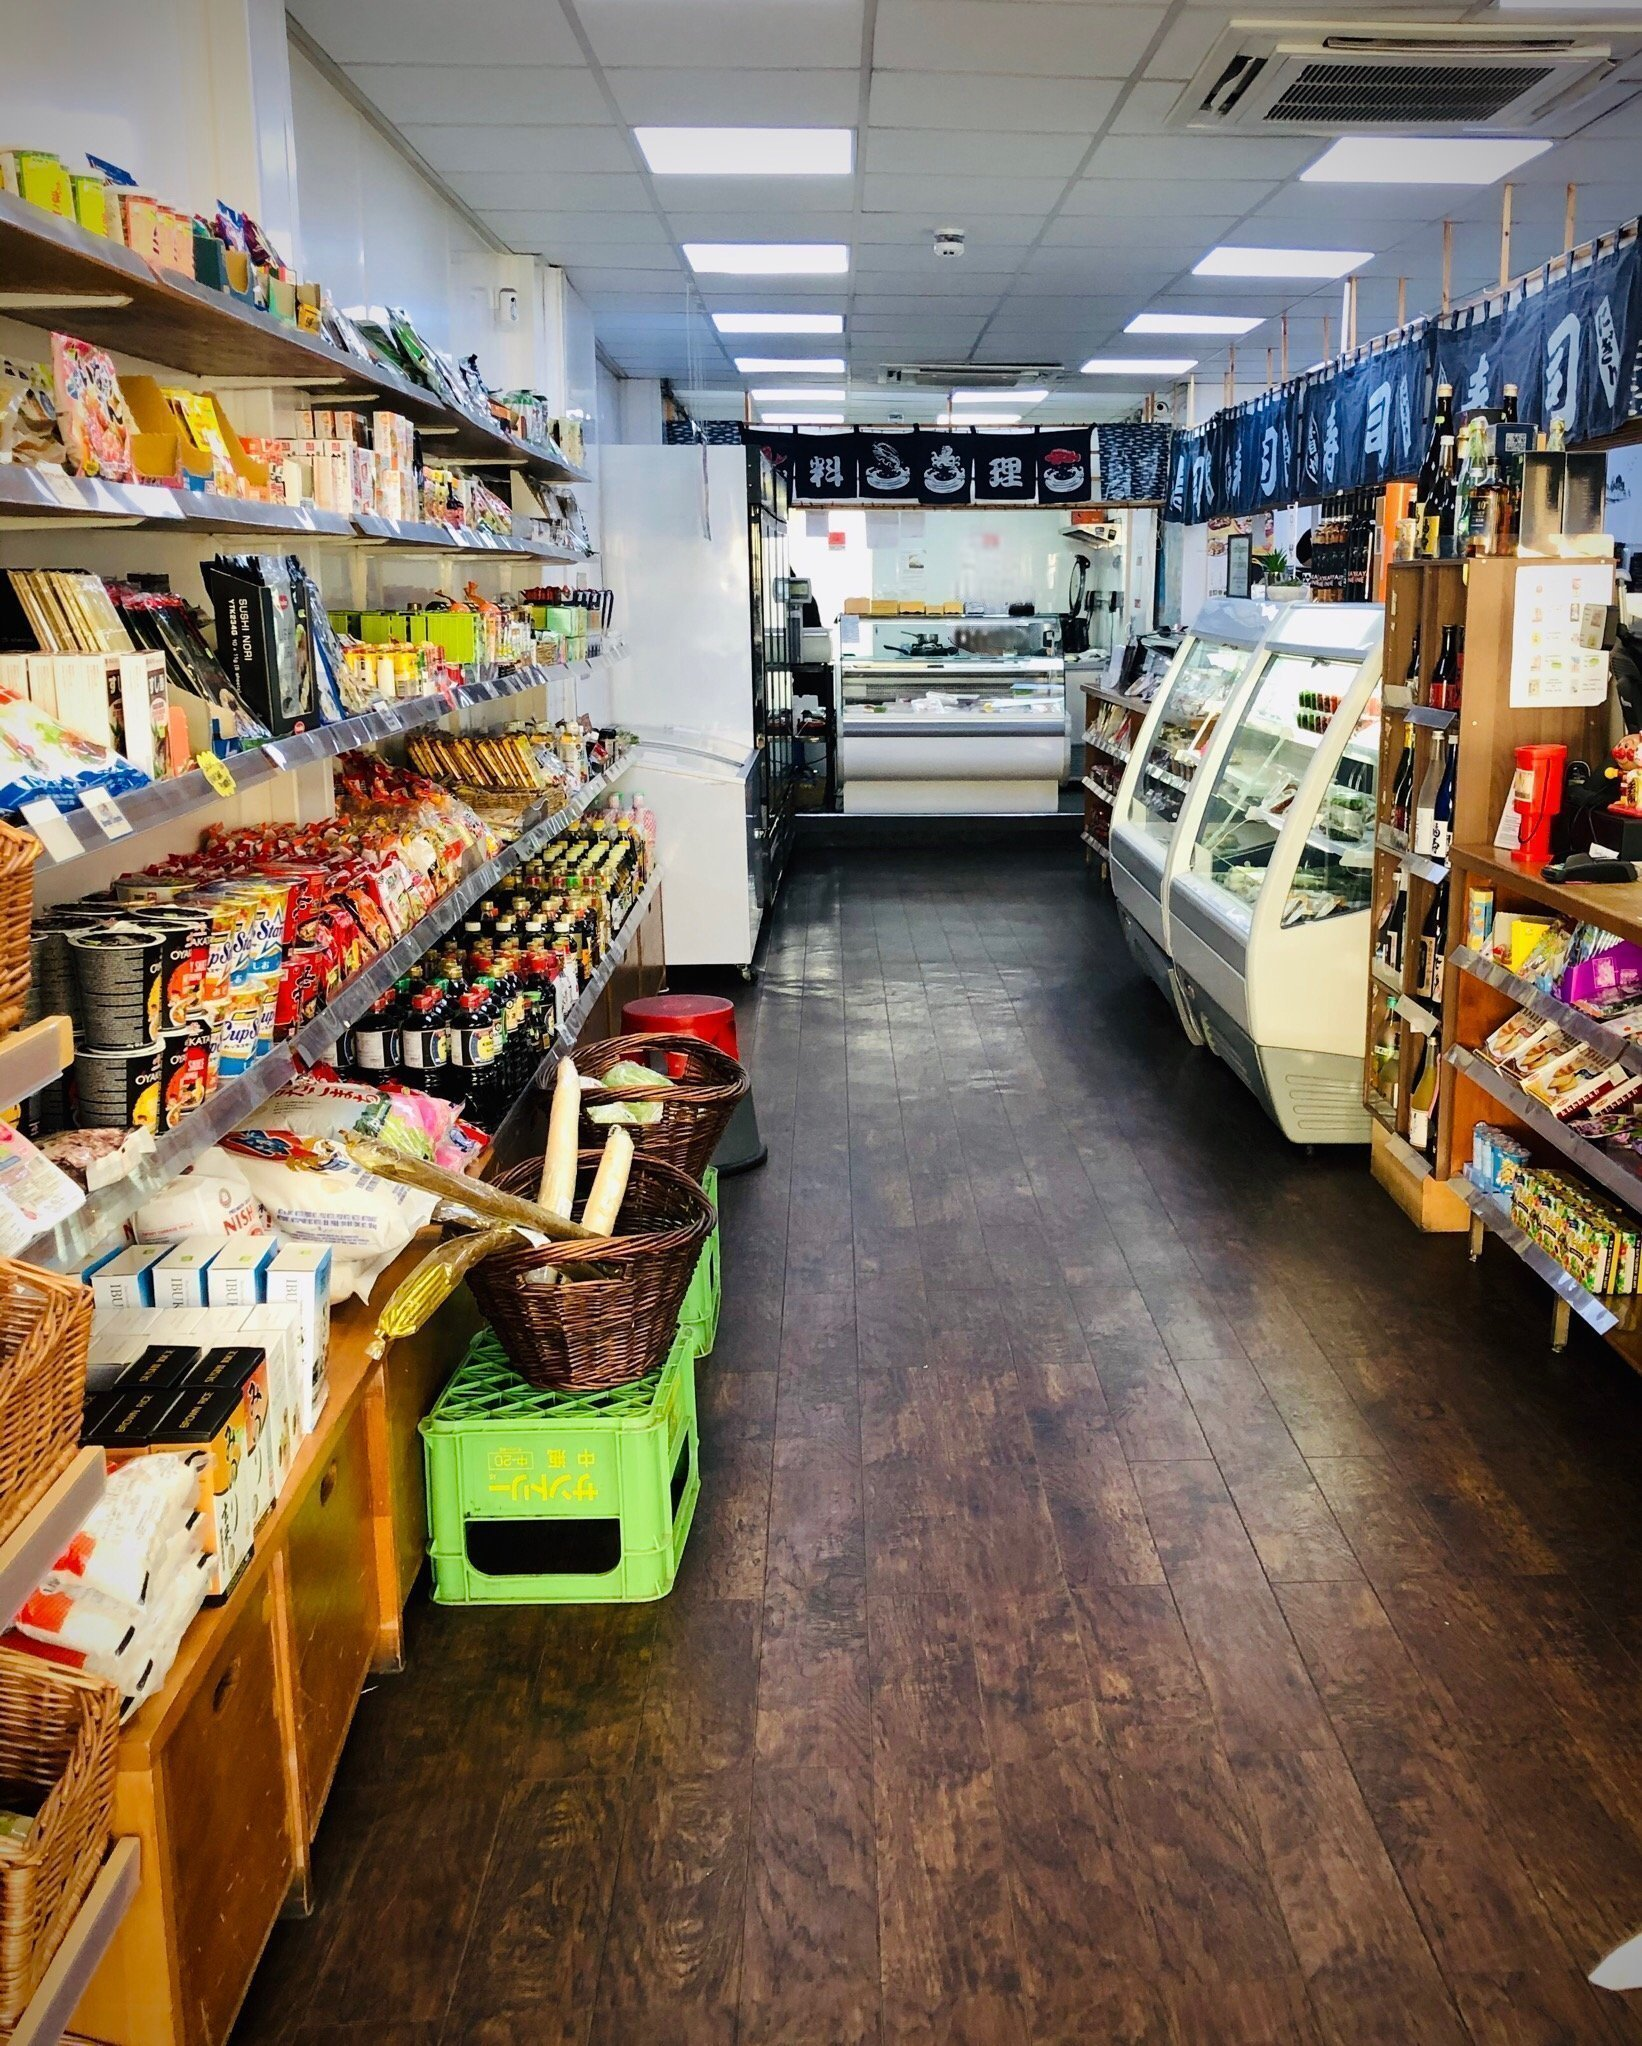 Inside the Fresh Fish Store